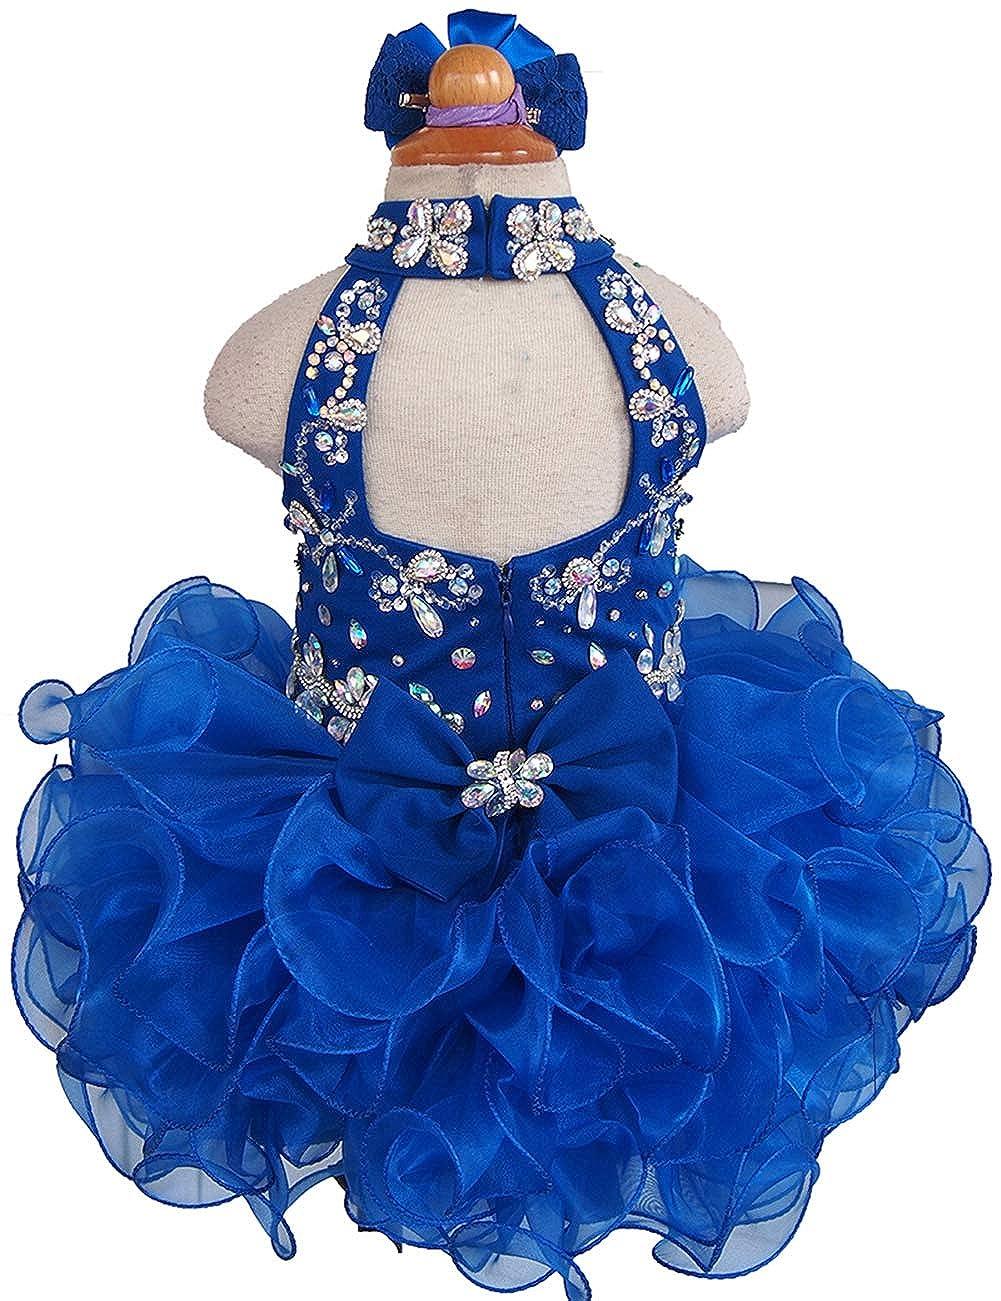 Jenniferwu Infant Toddler Baby Newborn Little Girls Pageant Party Birthday Dress G284-6 Blue Size 4T